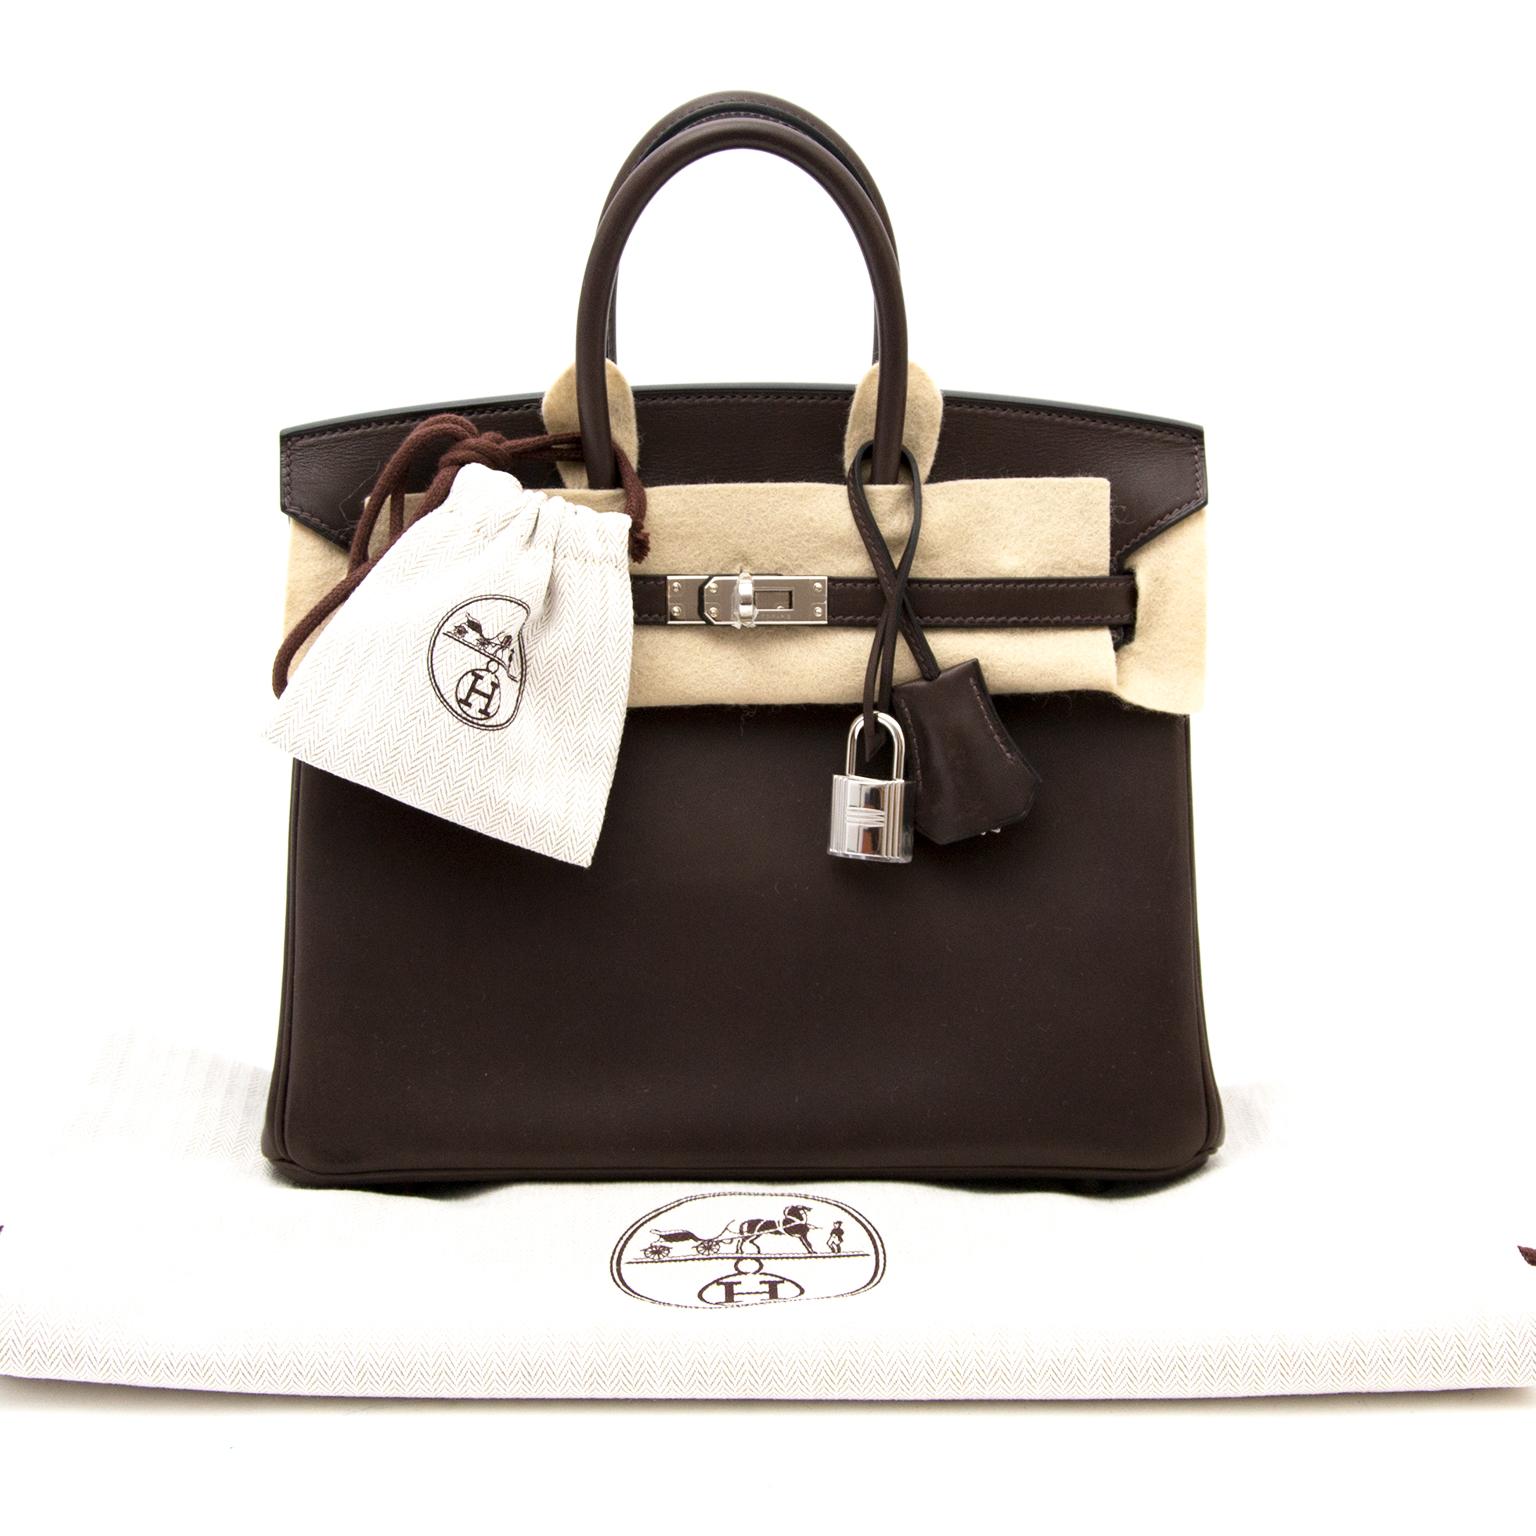 acheter en linge seconde main sac a main *NEW* Rare Brand New Hermès Birkin 25 Ebene Barenia